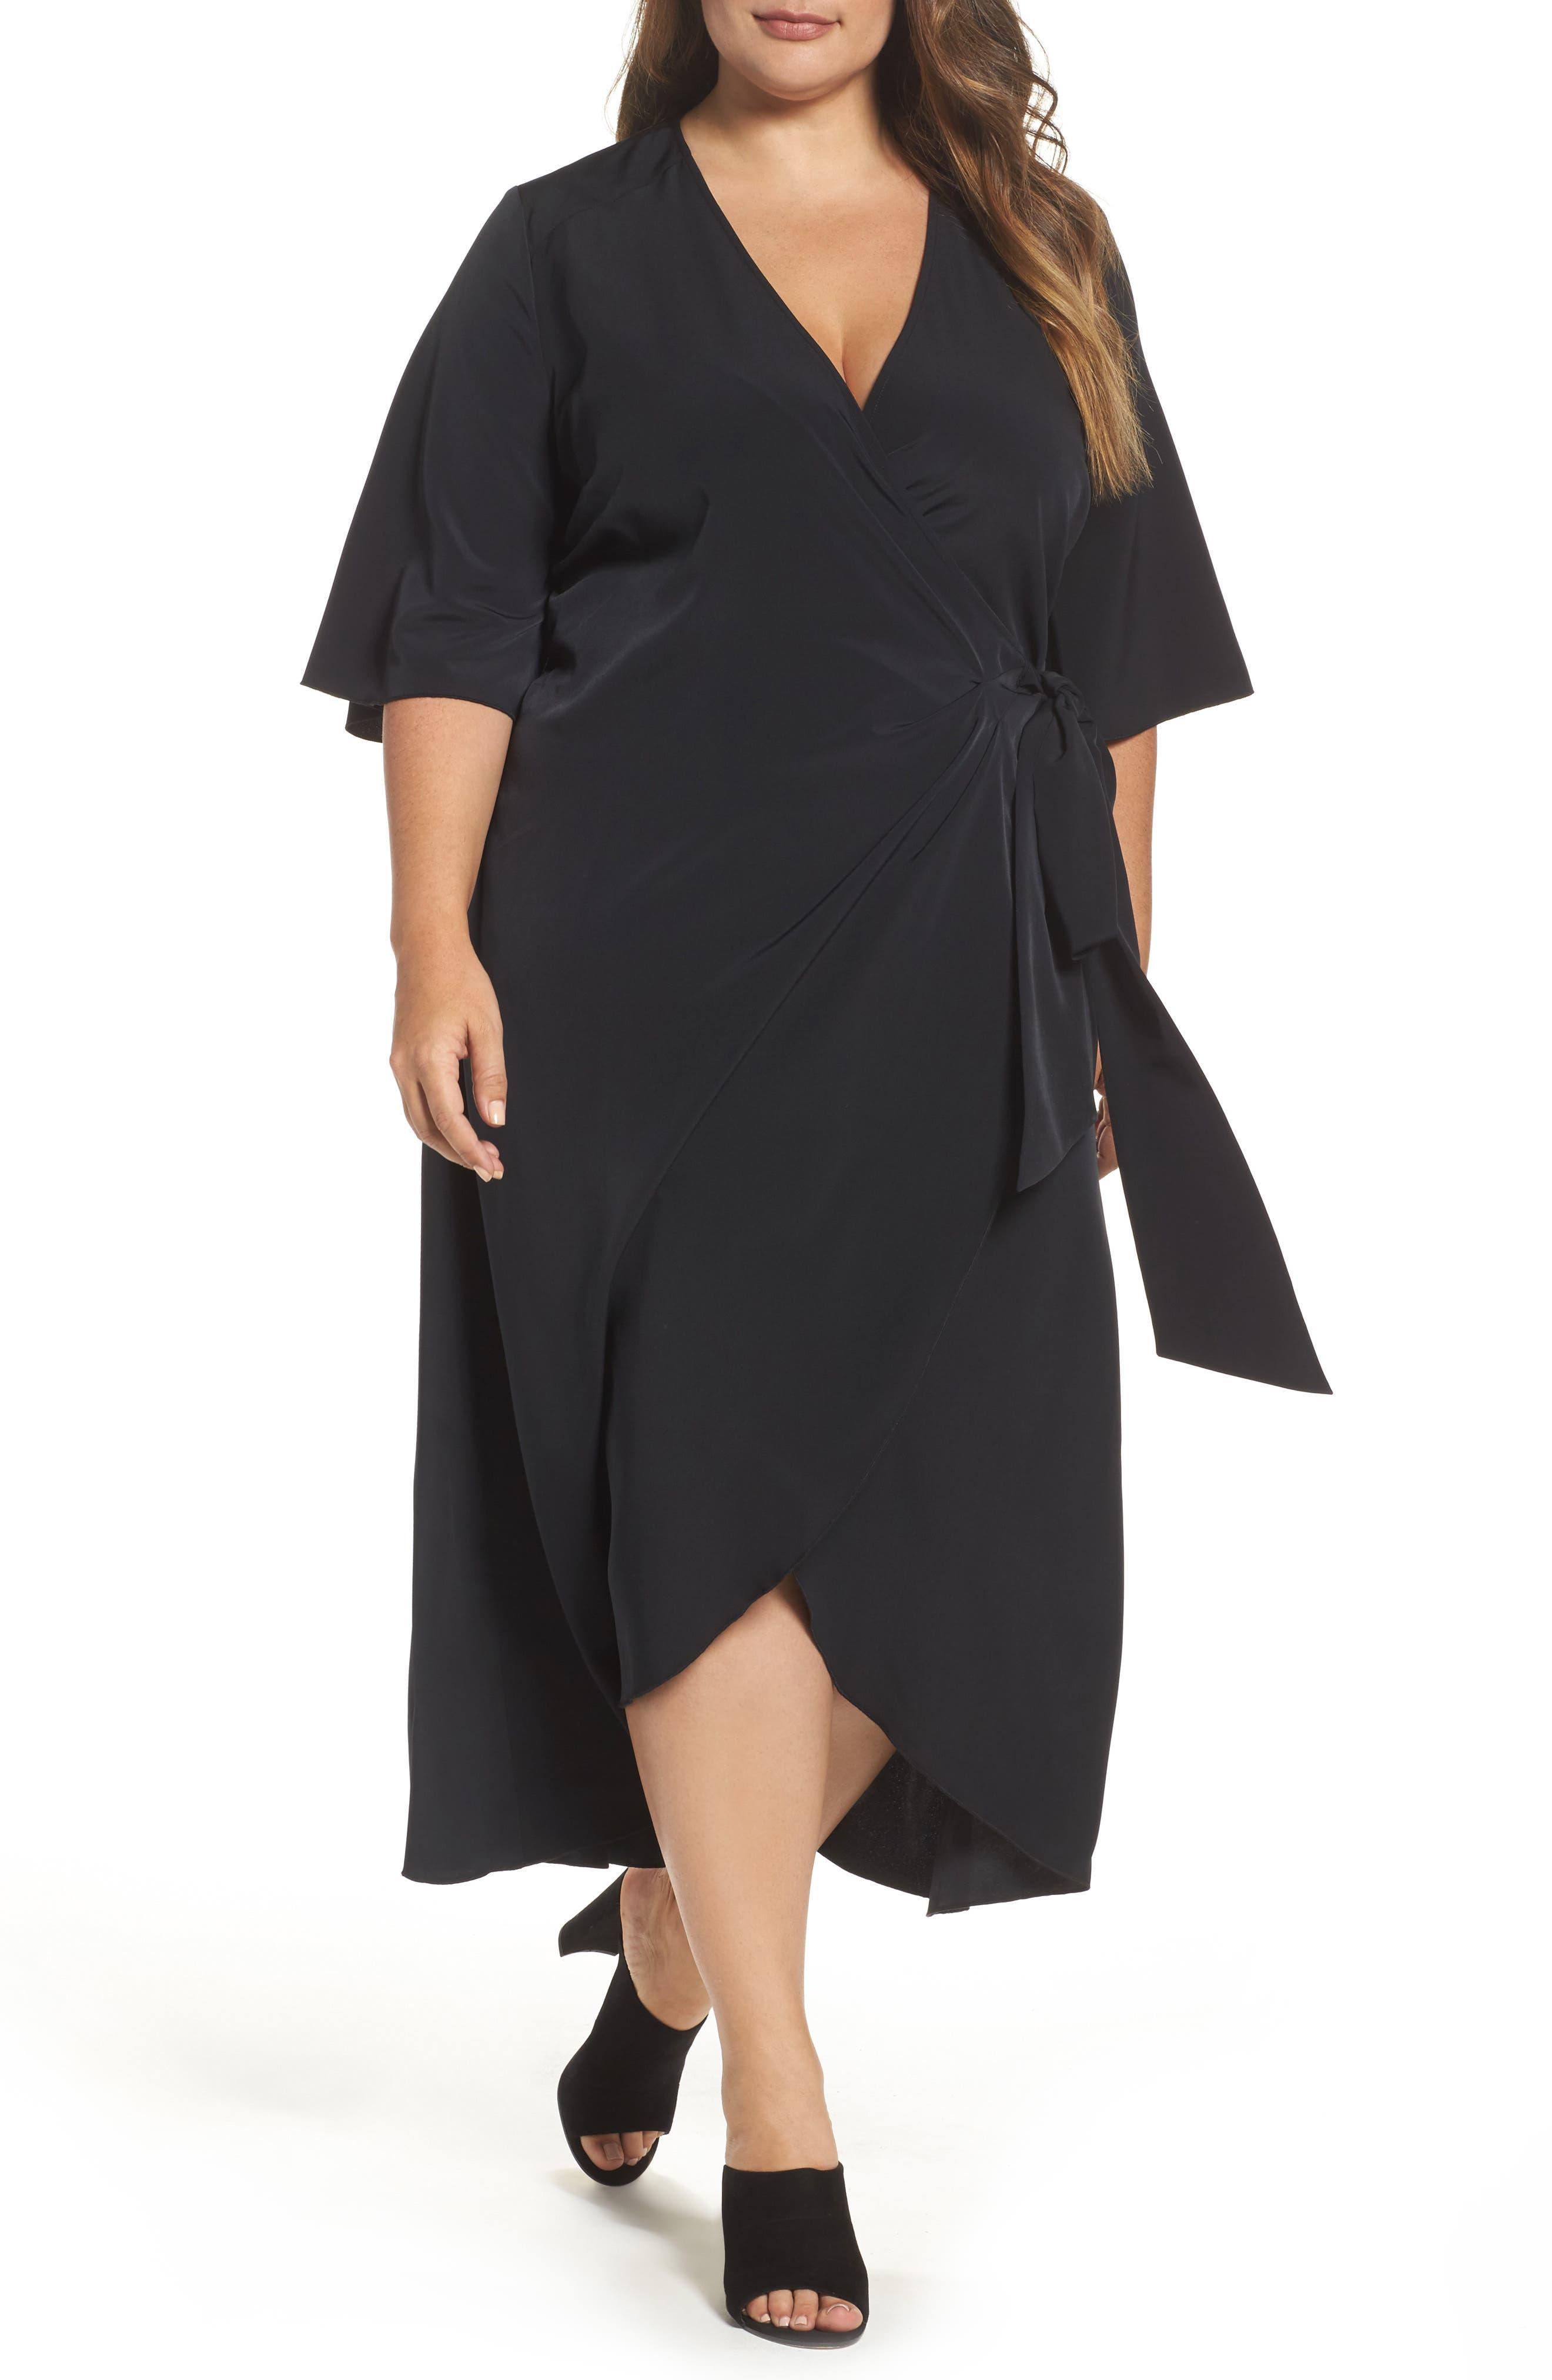 MELISSA MCCARTHY SEVEN7 Wrap Dress